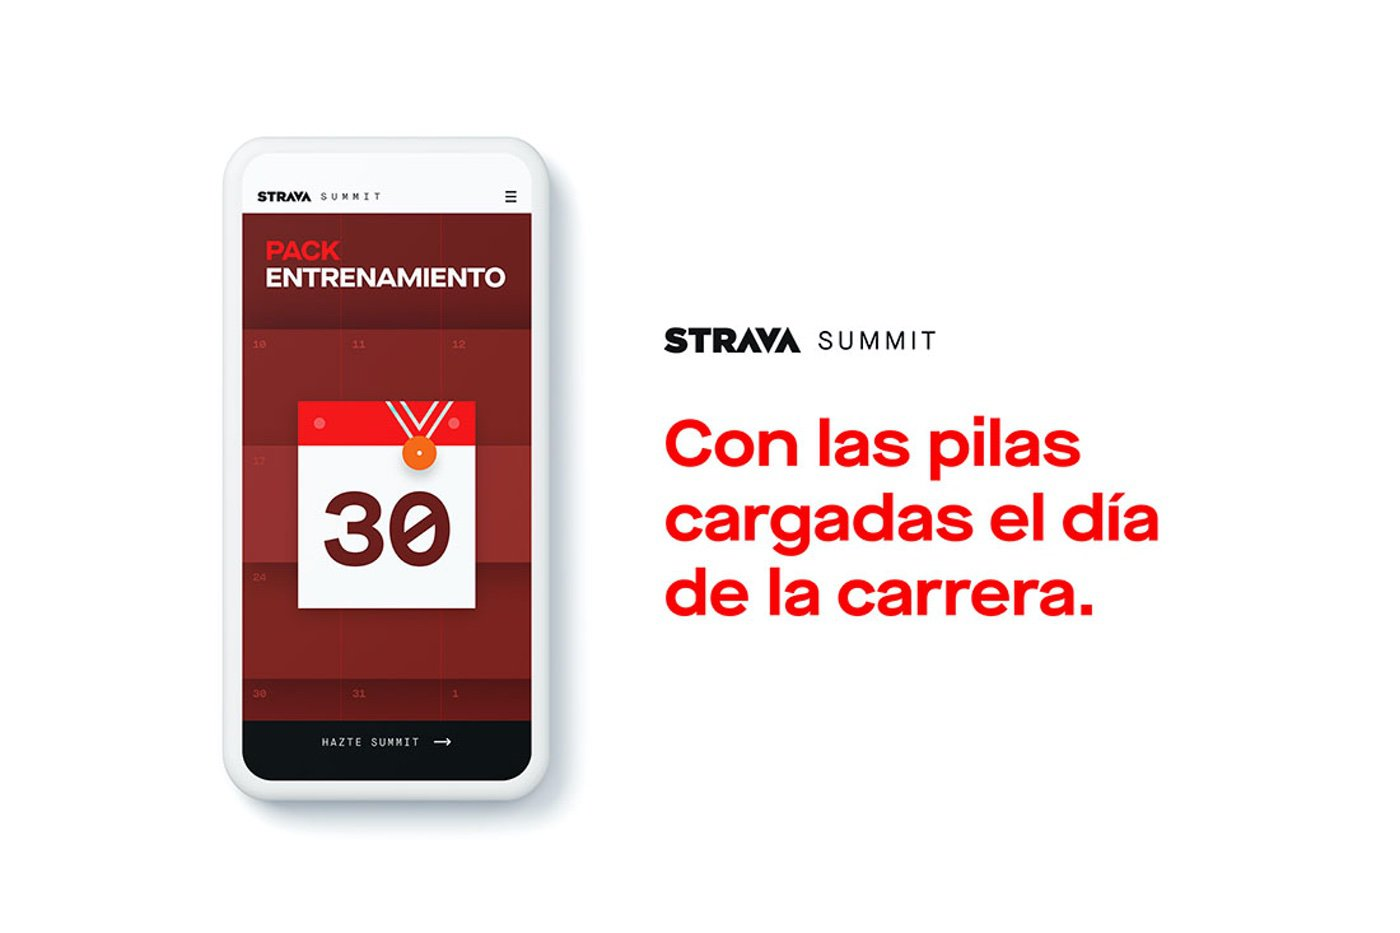 Strava Summit Entrenamiento